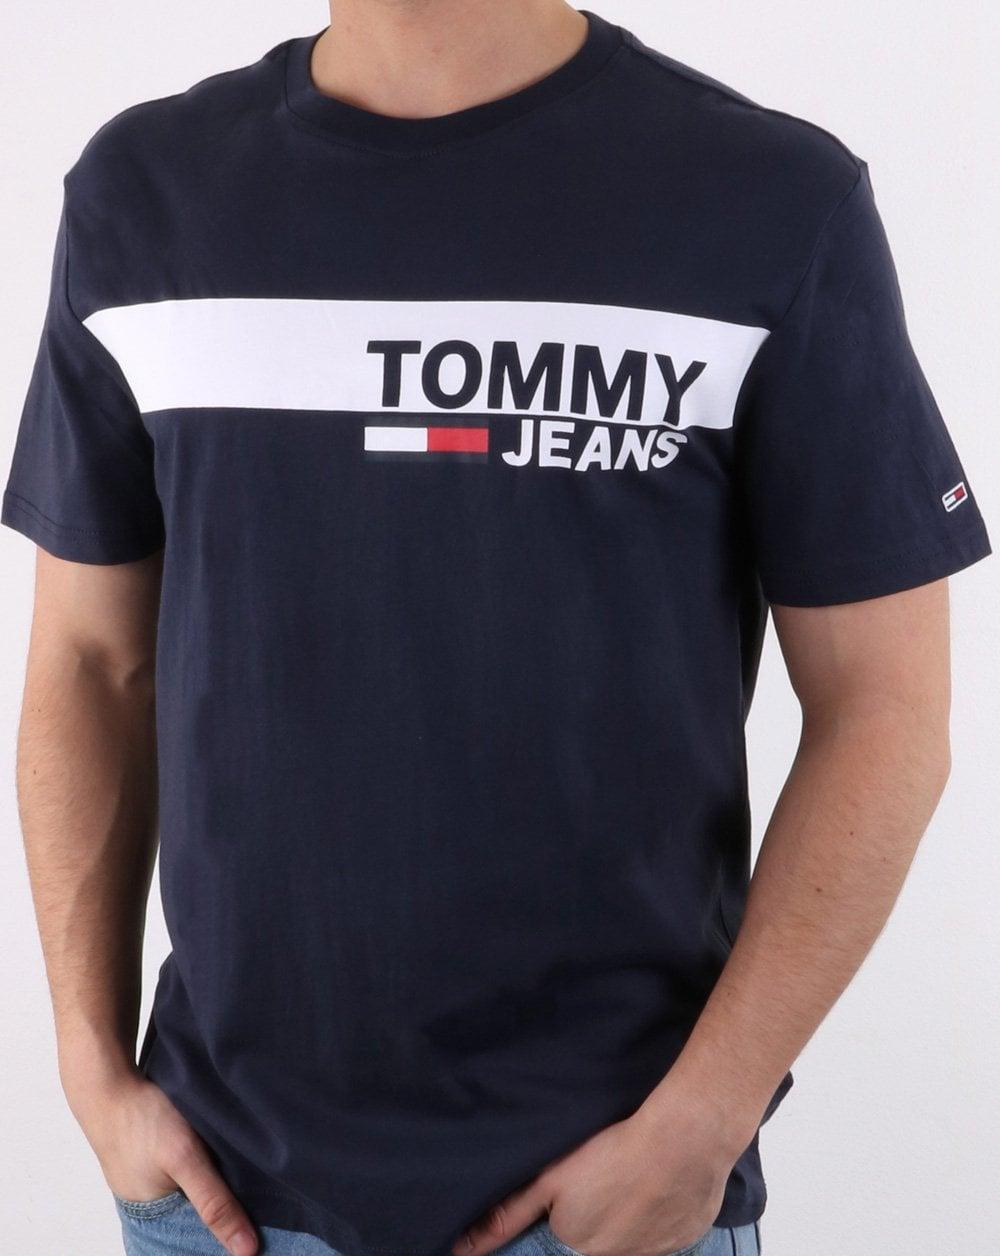 ea84f17e59a52 Tommy Hilfiger Jeans Tommy Hilfiger Box Logo Tee Black Iris